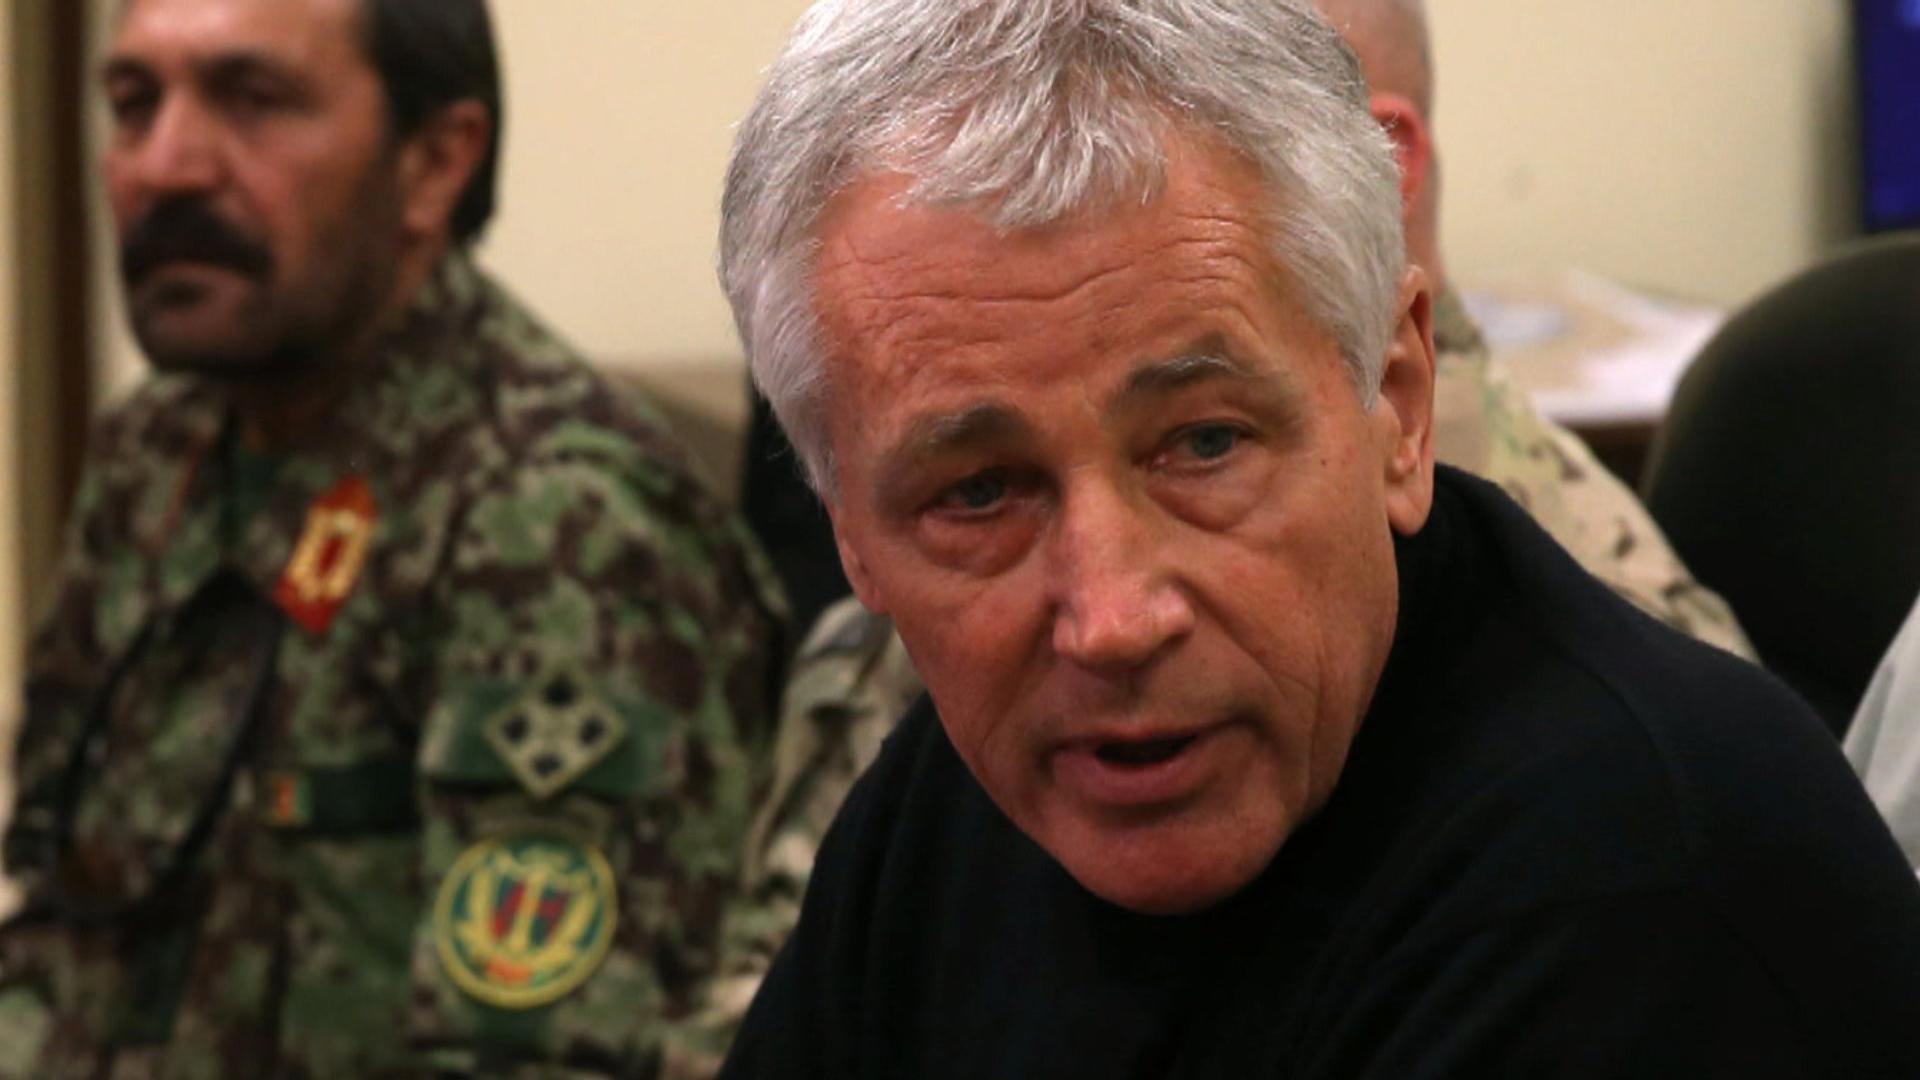 Battle for Hagel on shrinking military budget